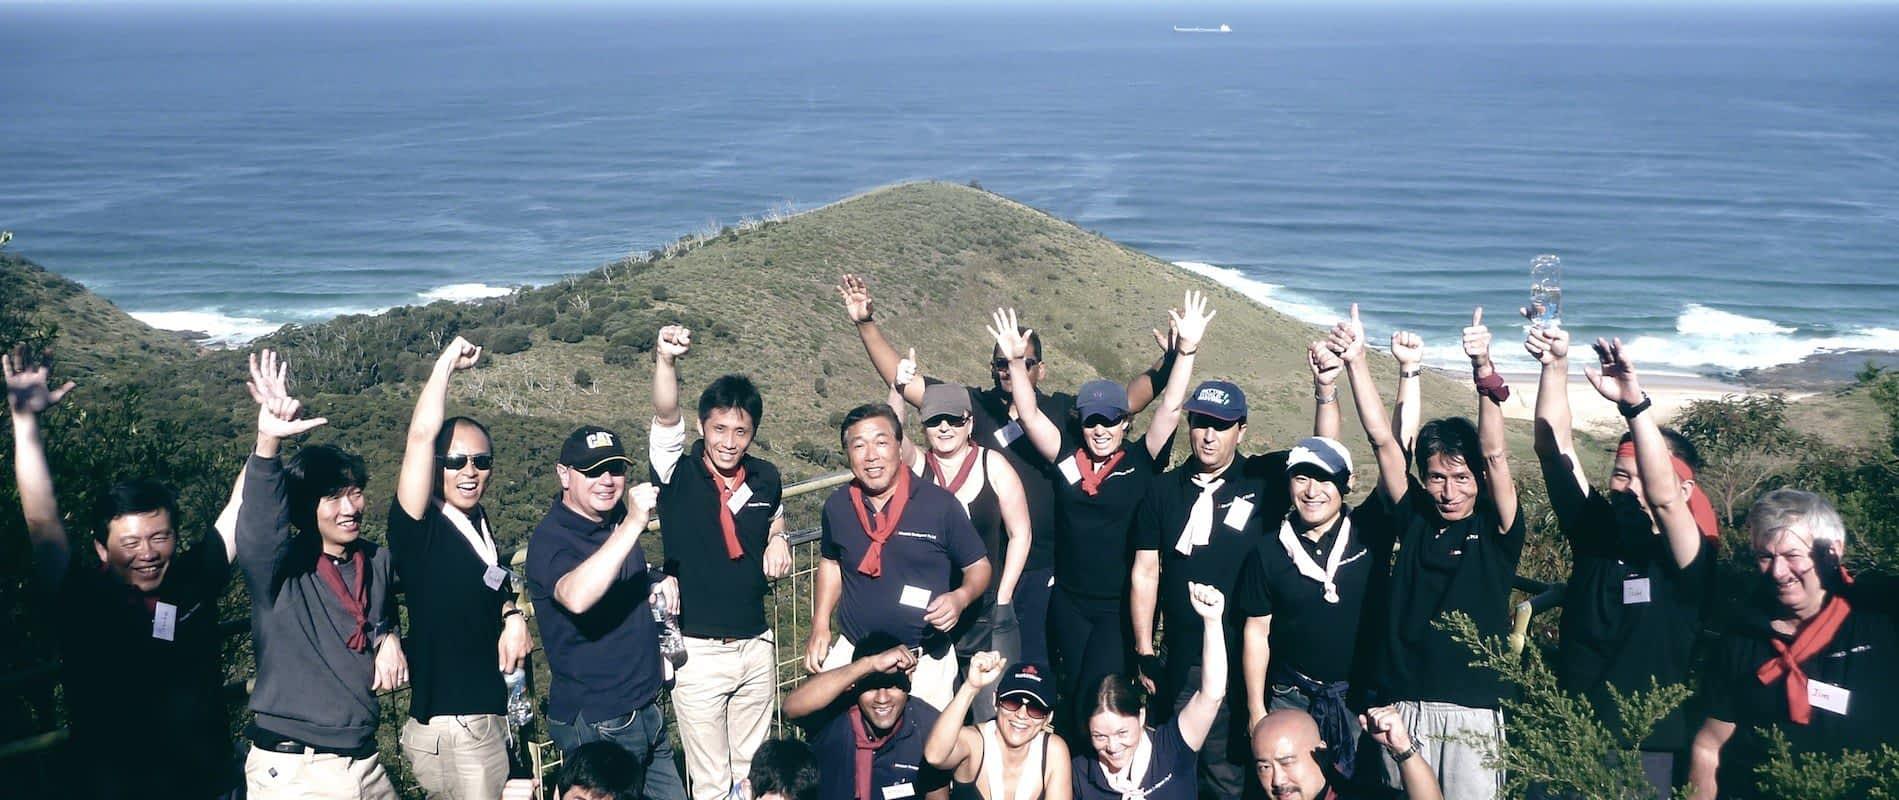 https://mlcb8szwyxfv.i.optimole.com/tTCGqh8-D2NWK4c9/w:auto/h:auto/q:62/https://www.uniqueteambuilding.com.au/wp-content/uploads/2014/06/team-building-2.jpg